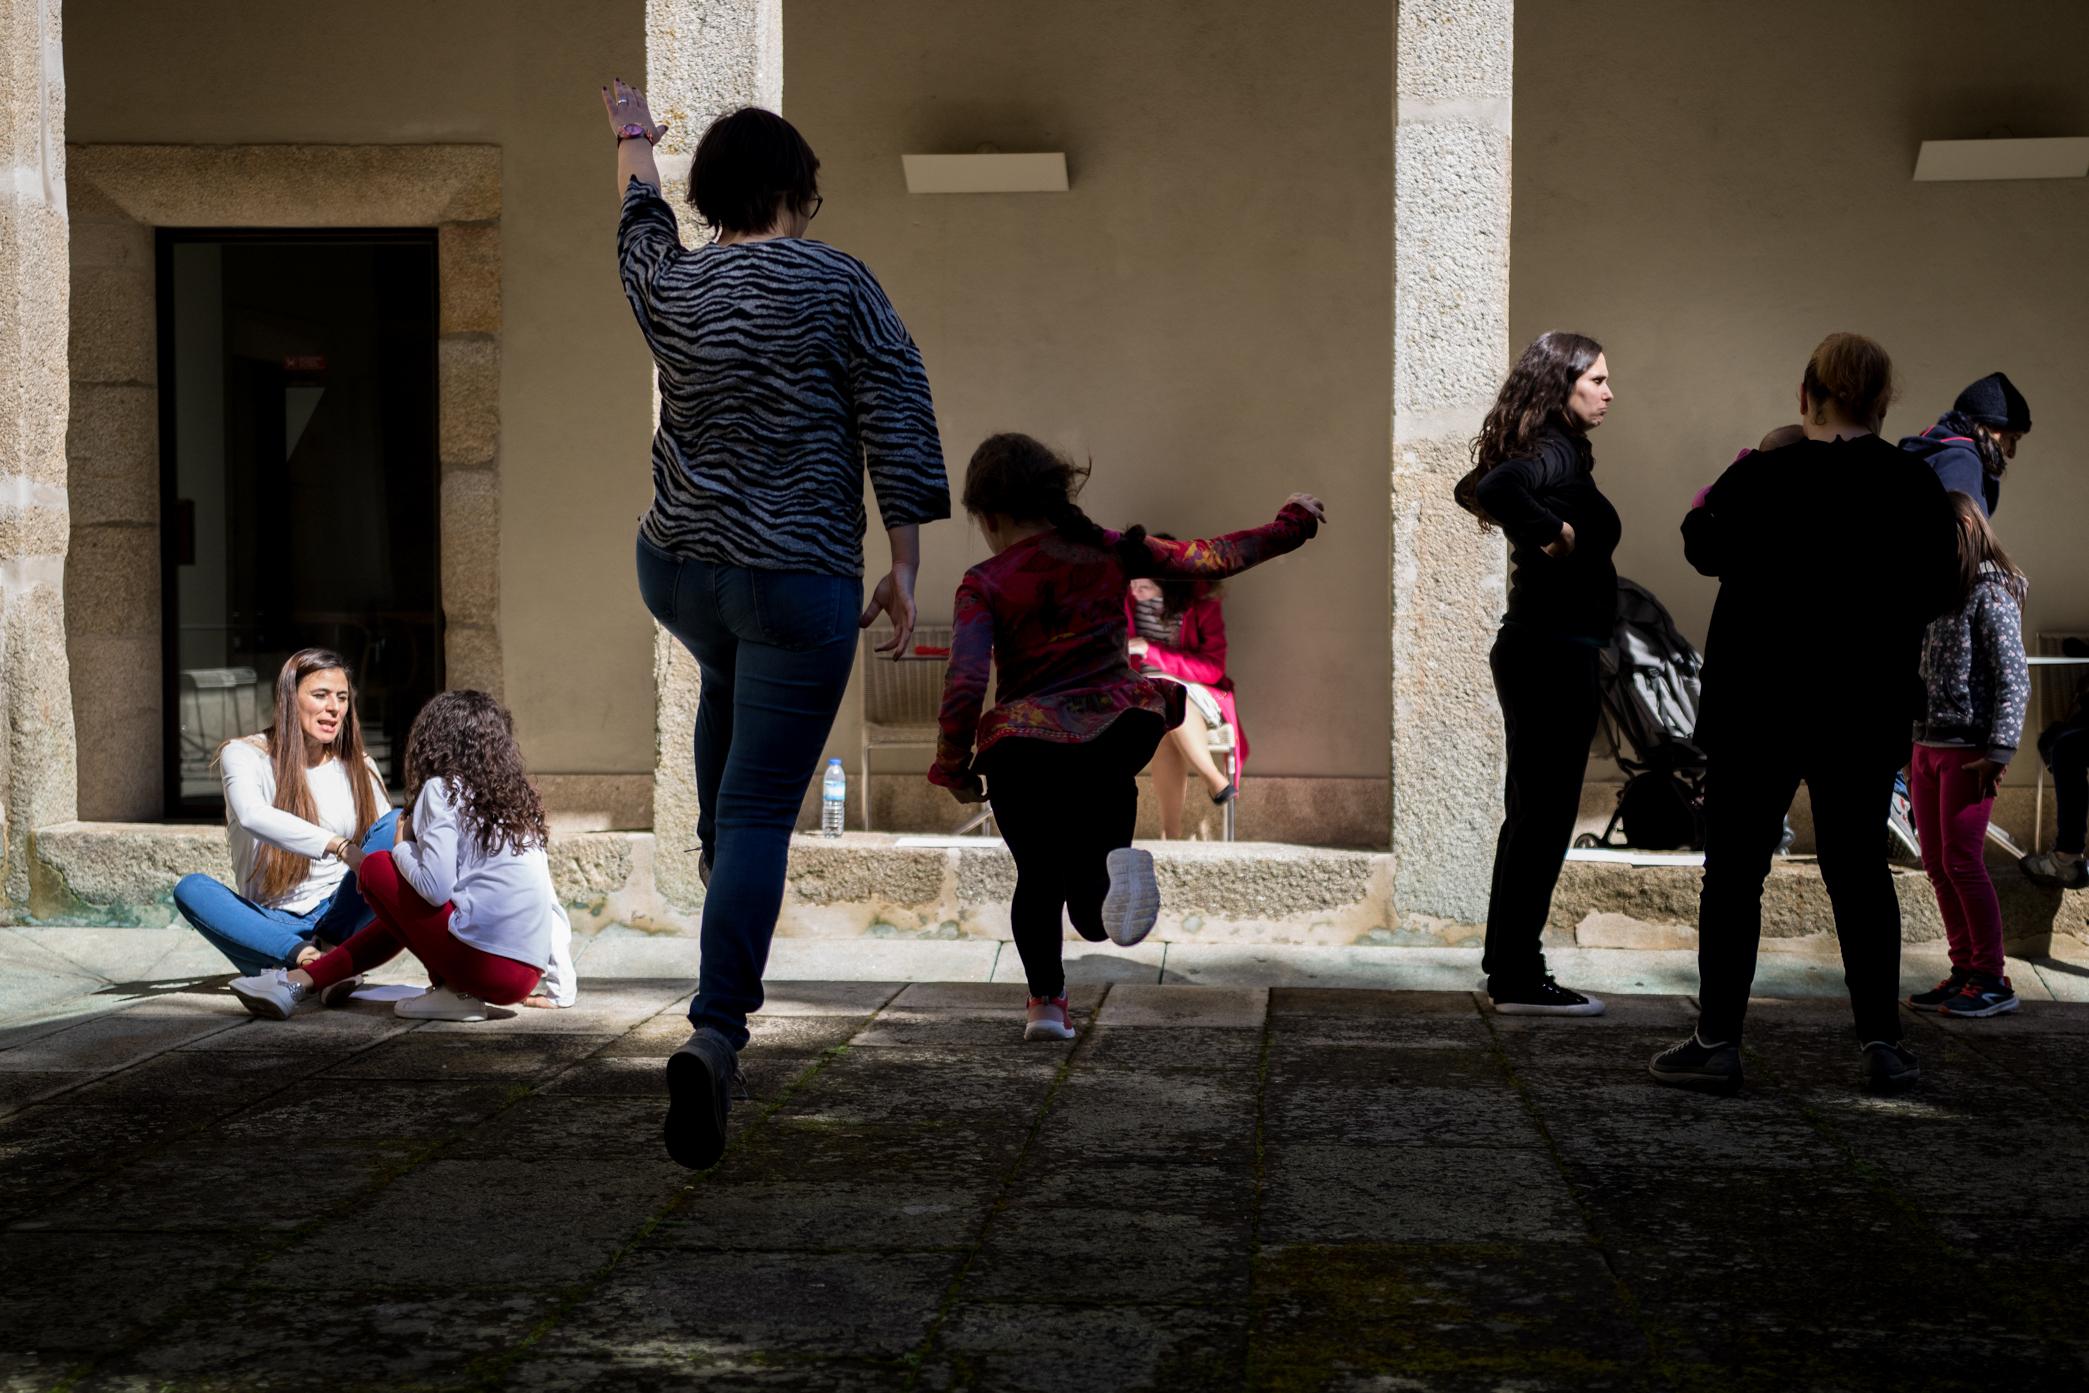 Workshop Artístico de Dança dinamizado pelo bailarino Romulus Neagu – 9 de março de 2019